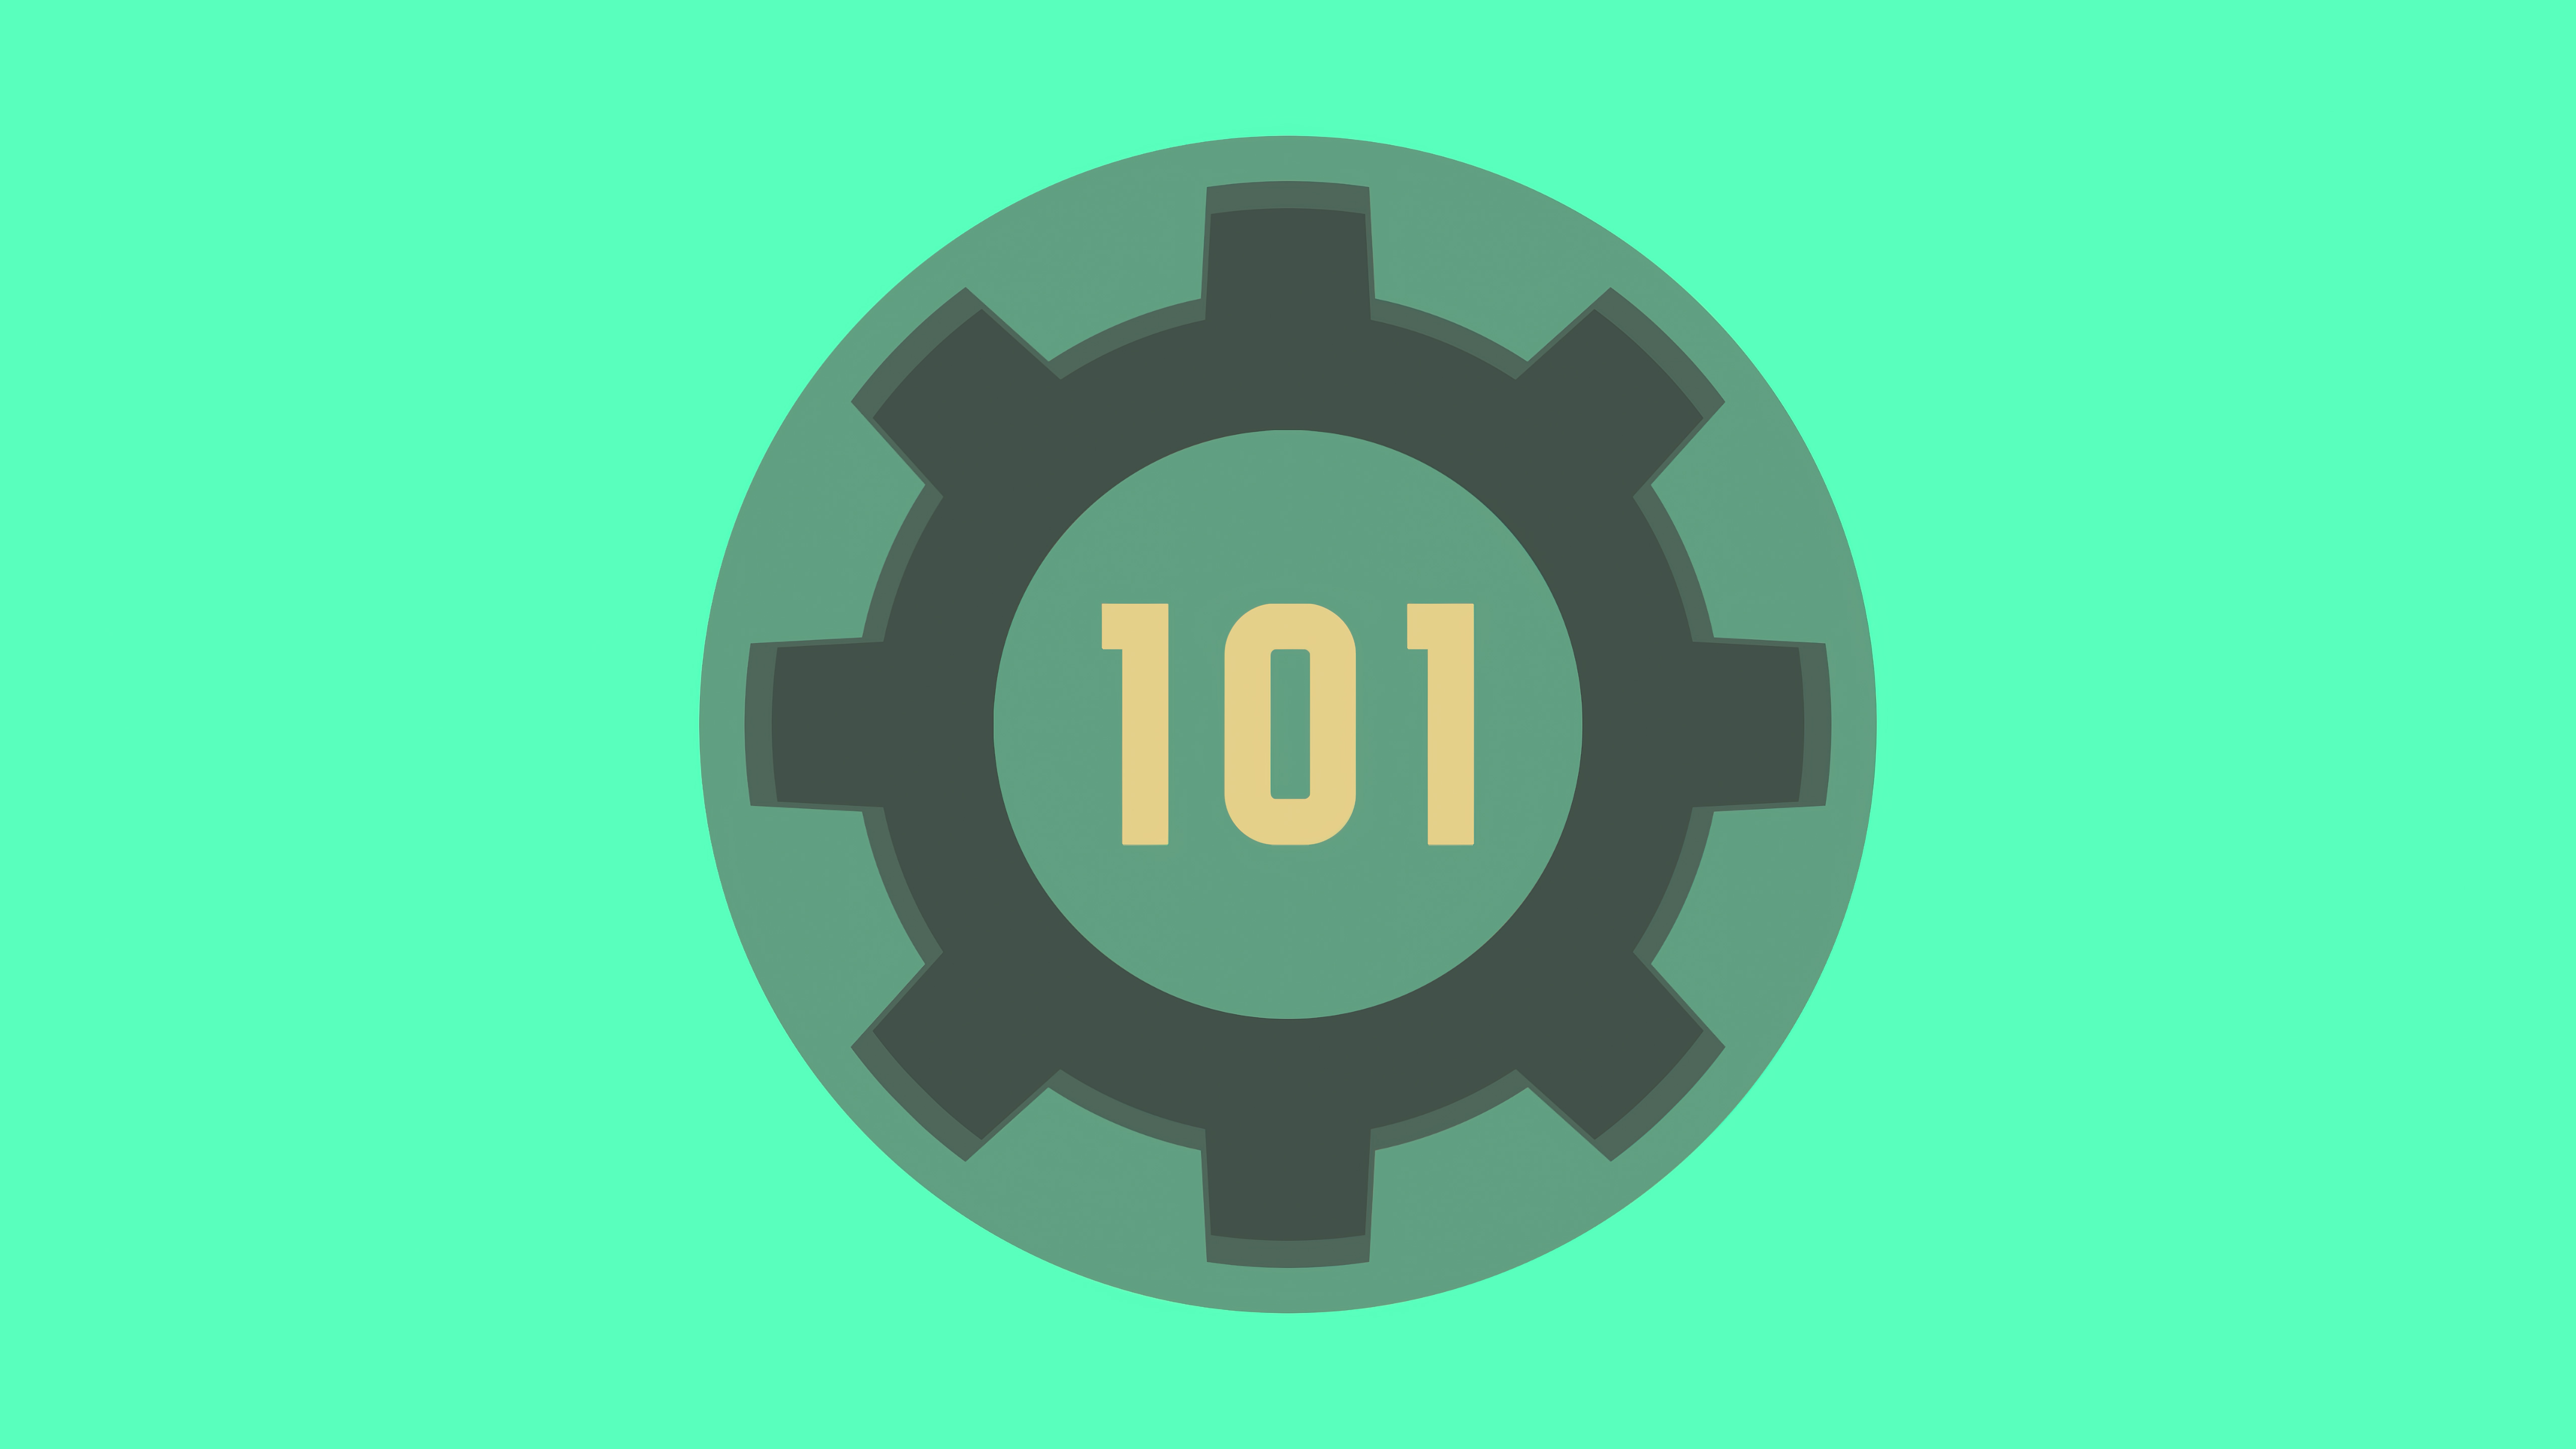 fallout 3 vault 101 minimal 4k 1618136928 - Fallout 3 Vault 101 Minimal 4k - Fallout 3 Vault 101 Minimal 4k wallpapers